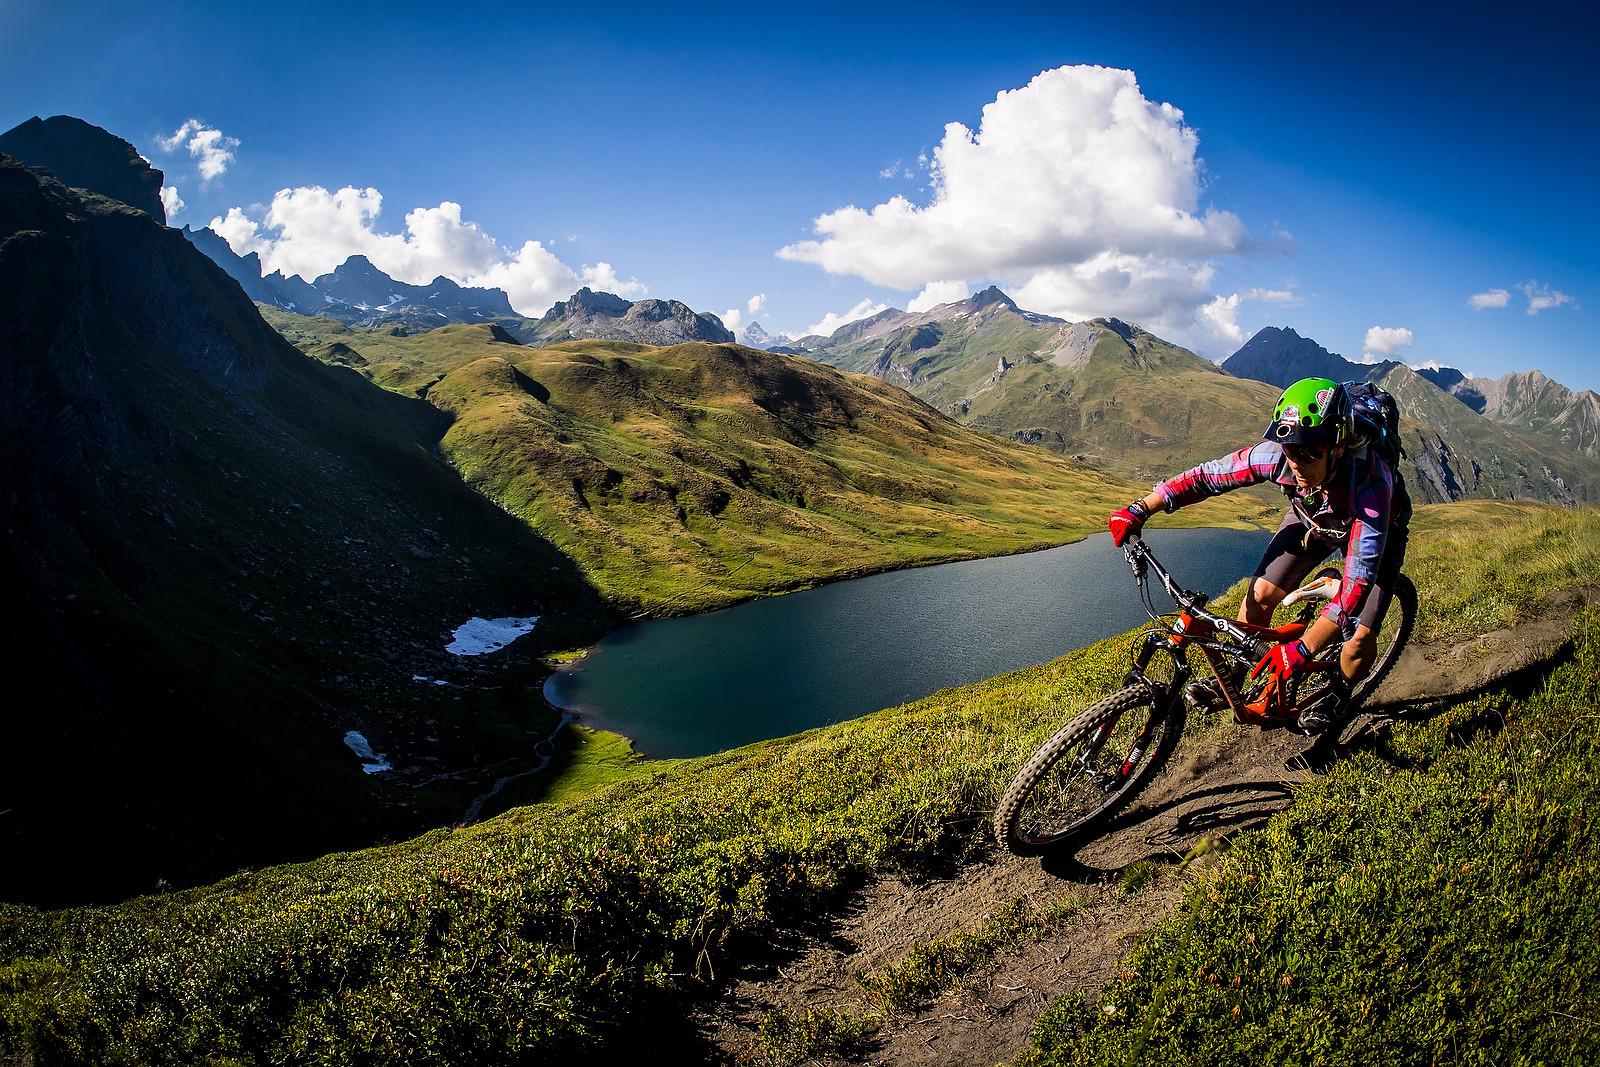 Epic Alpine Singletrack in La Thuile, Italy - 2013 Enduro World Series 6, Enduro Des Nations Photo Recon - Mountain Biking Pictures - Vital MTB